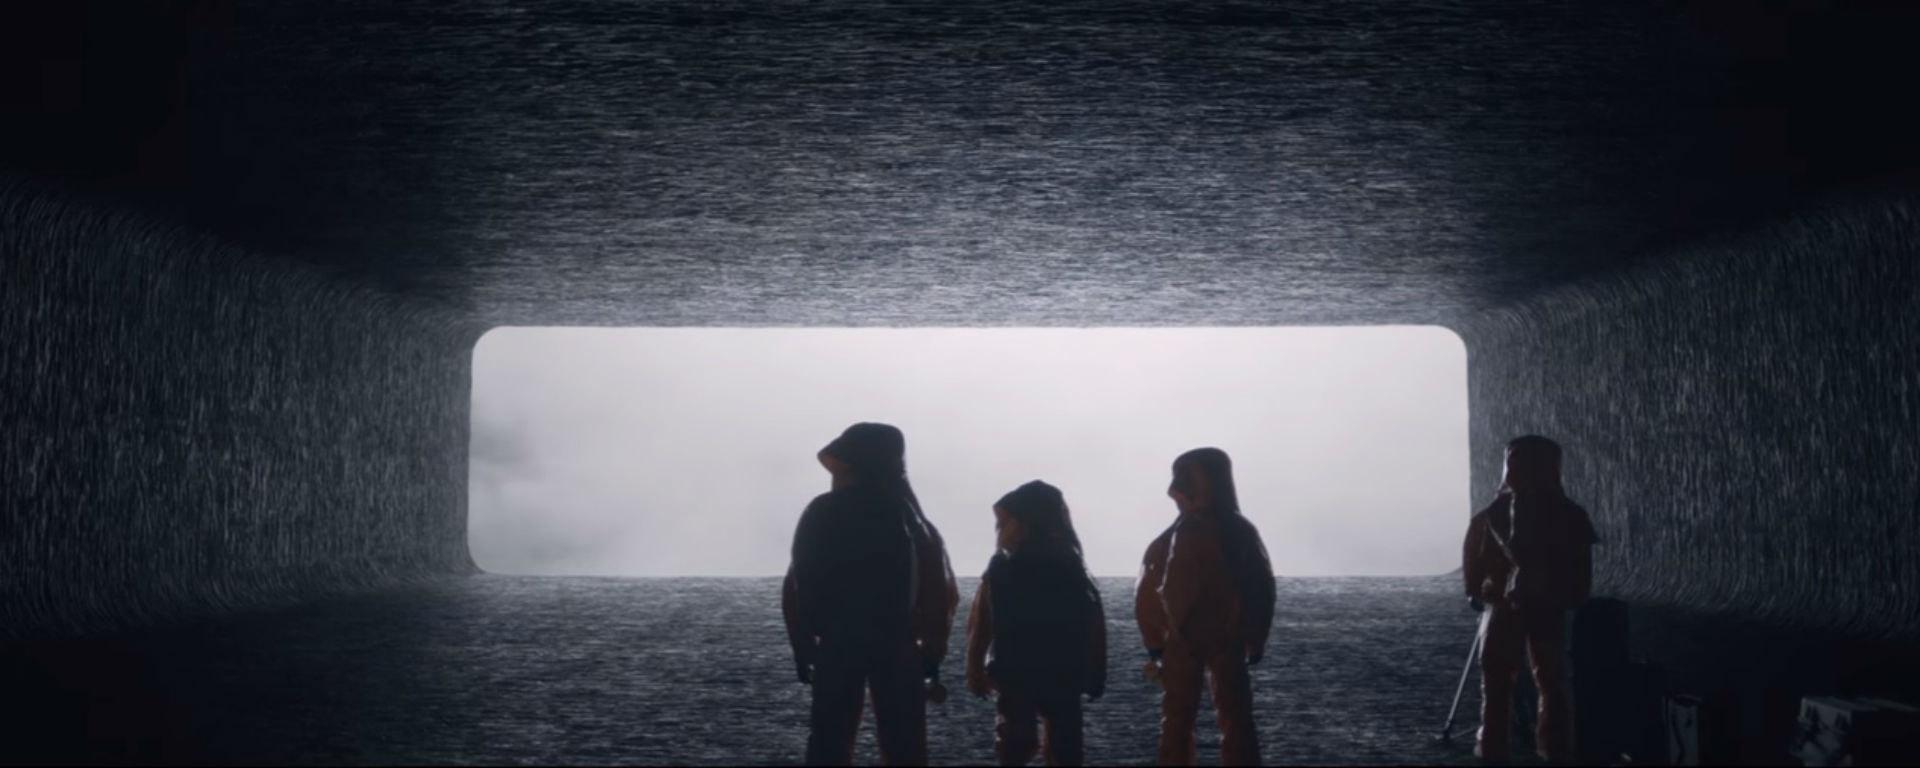 extraterrestre 2016 film